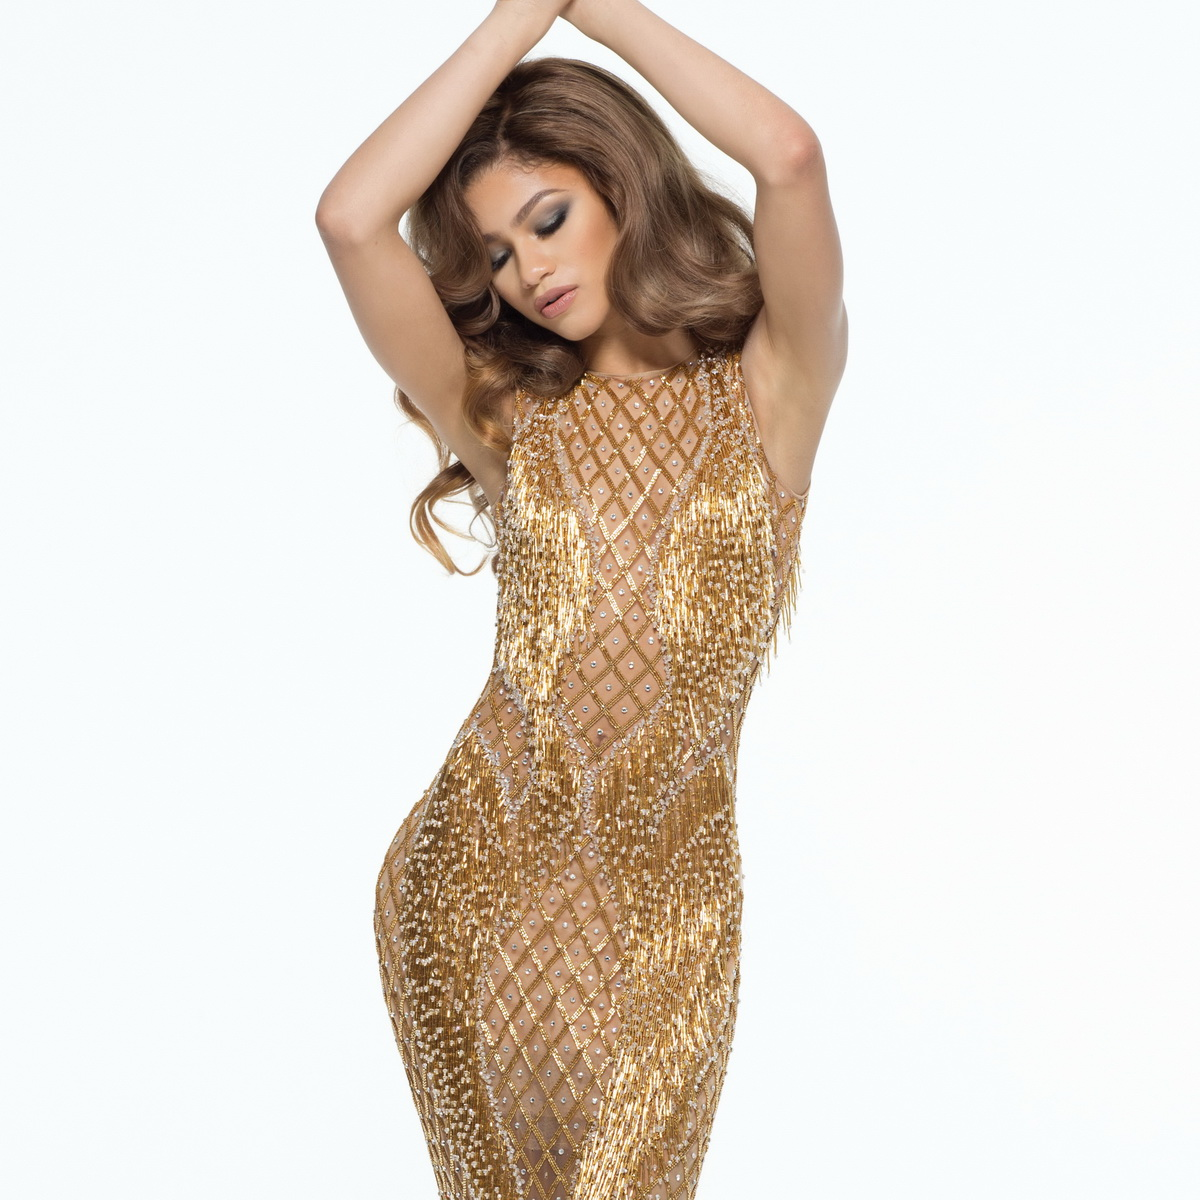 Zendaya sexy photo shoot for New You magazine 2016 Spring 4x HQ photos